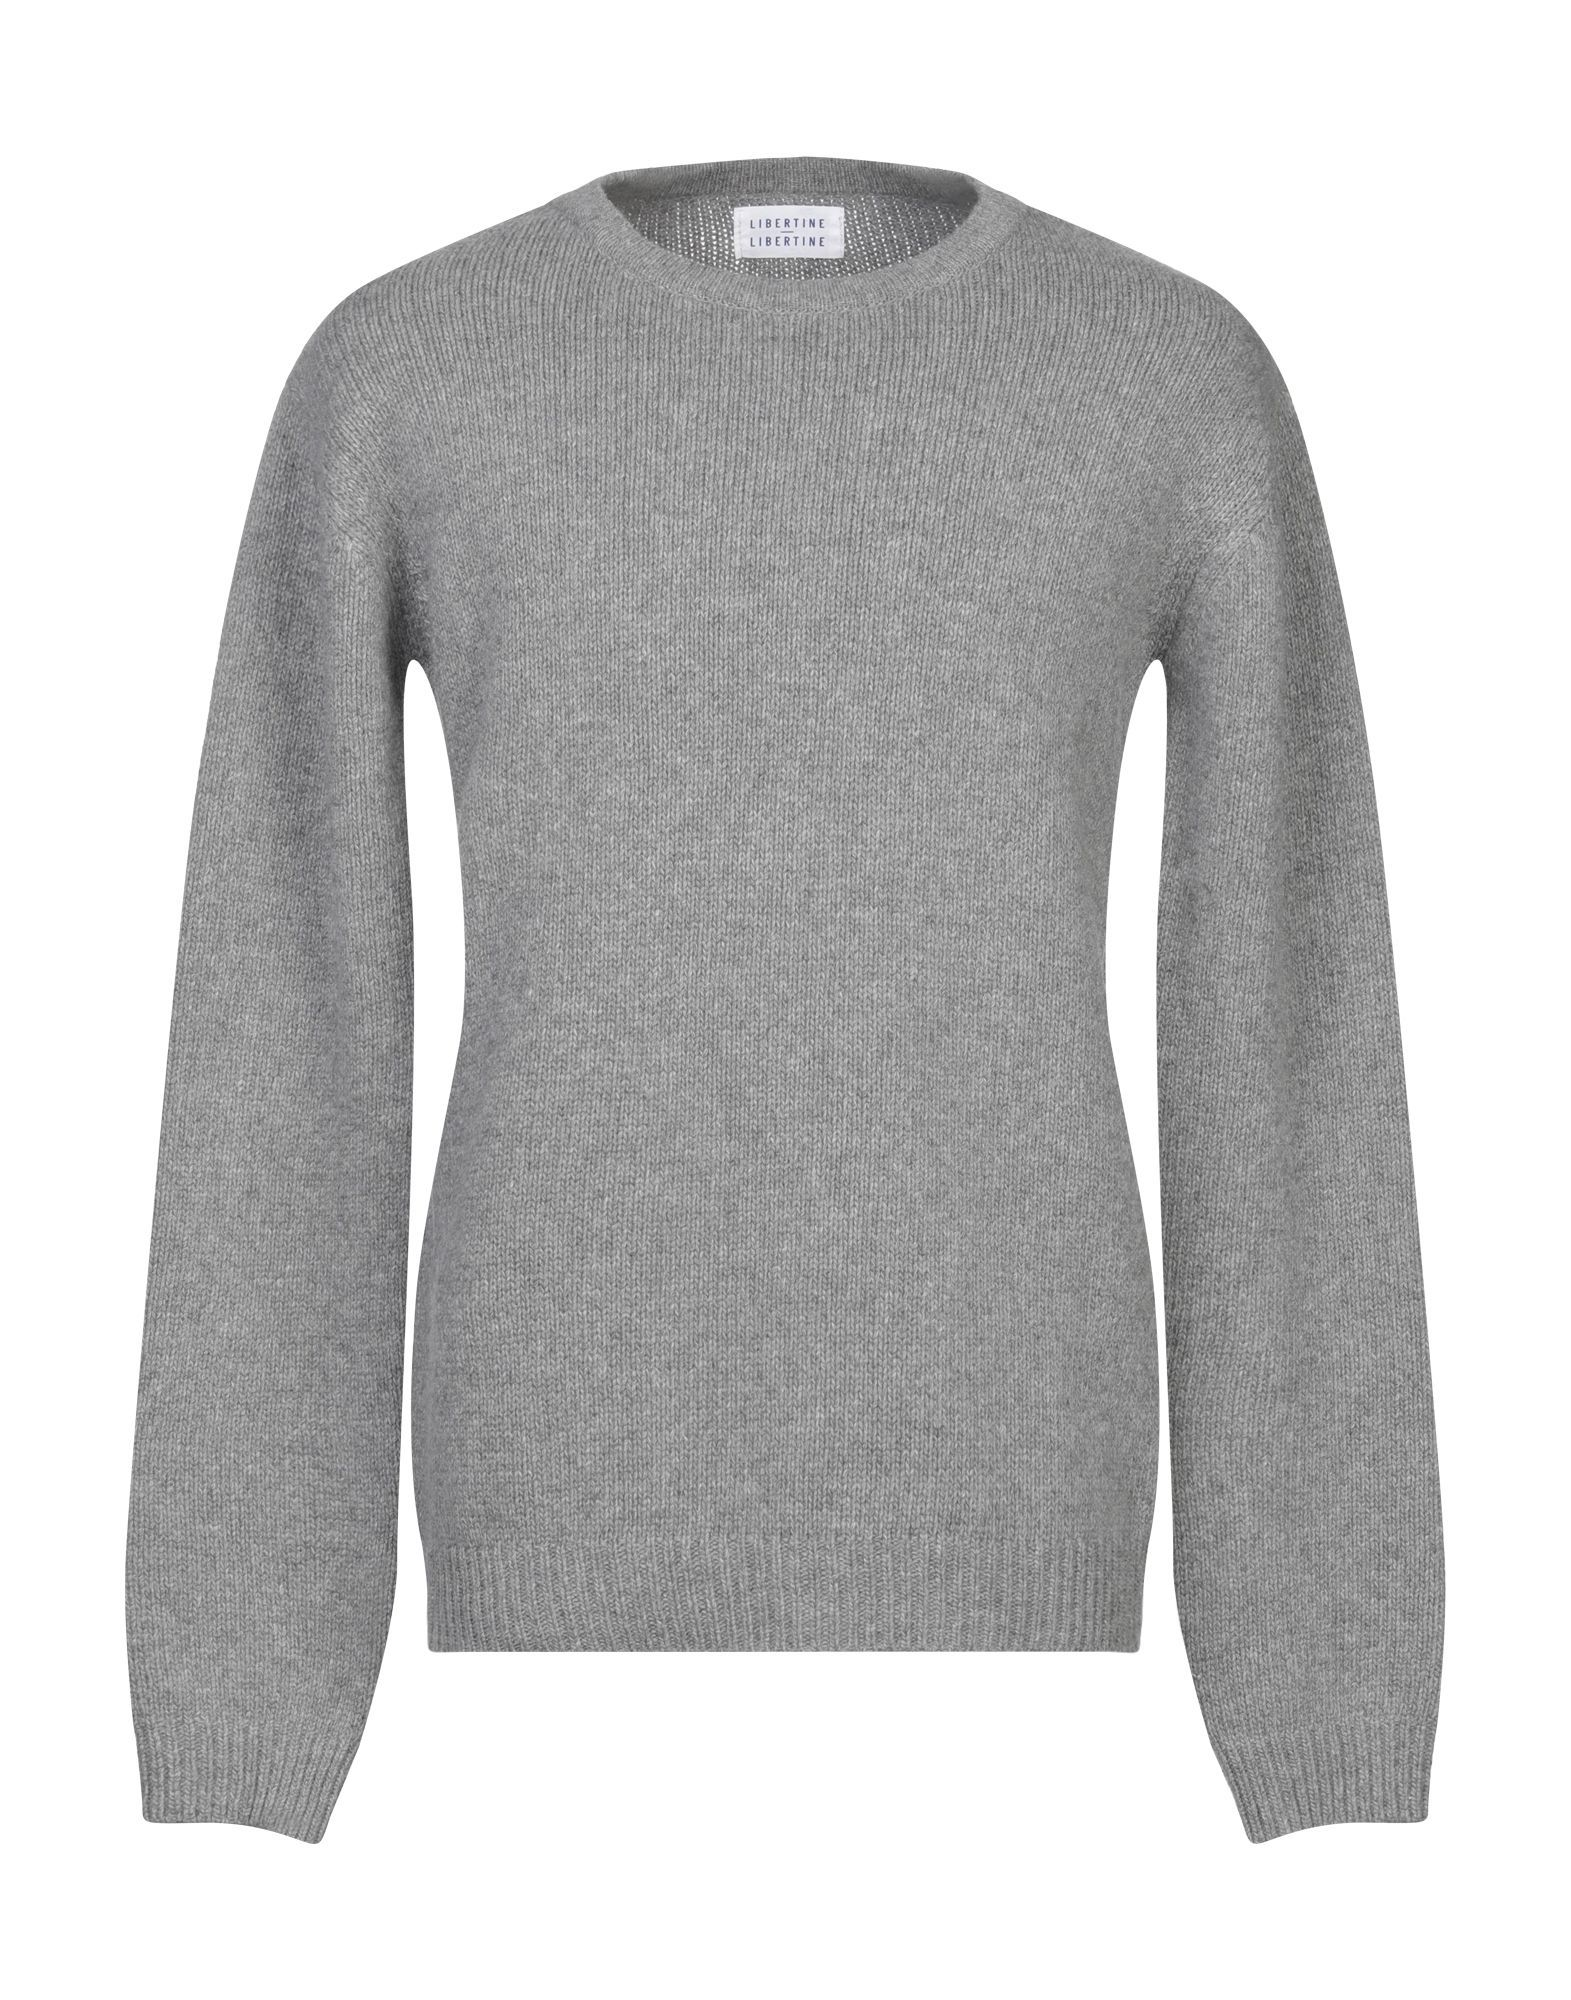 KNITWEAR Libertine-Libertine Grey Man Wool